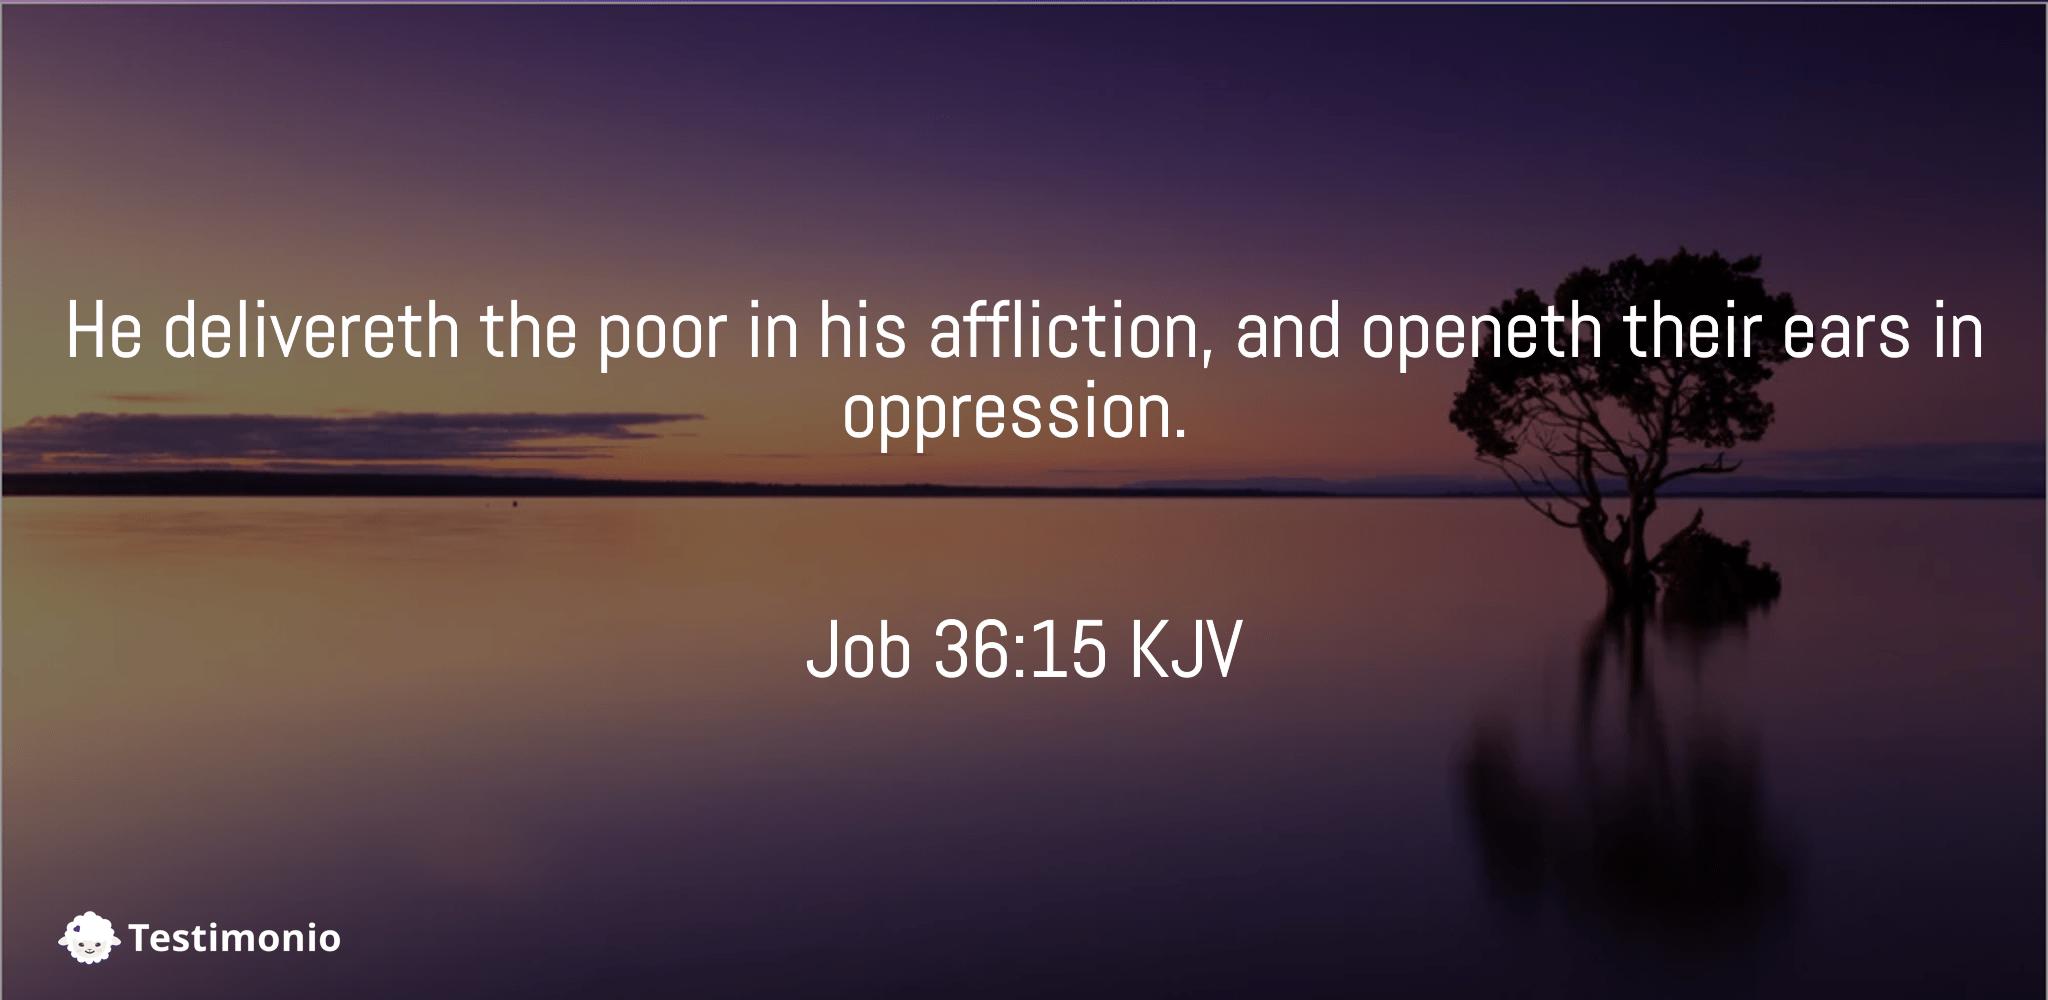 Job 36:15